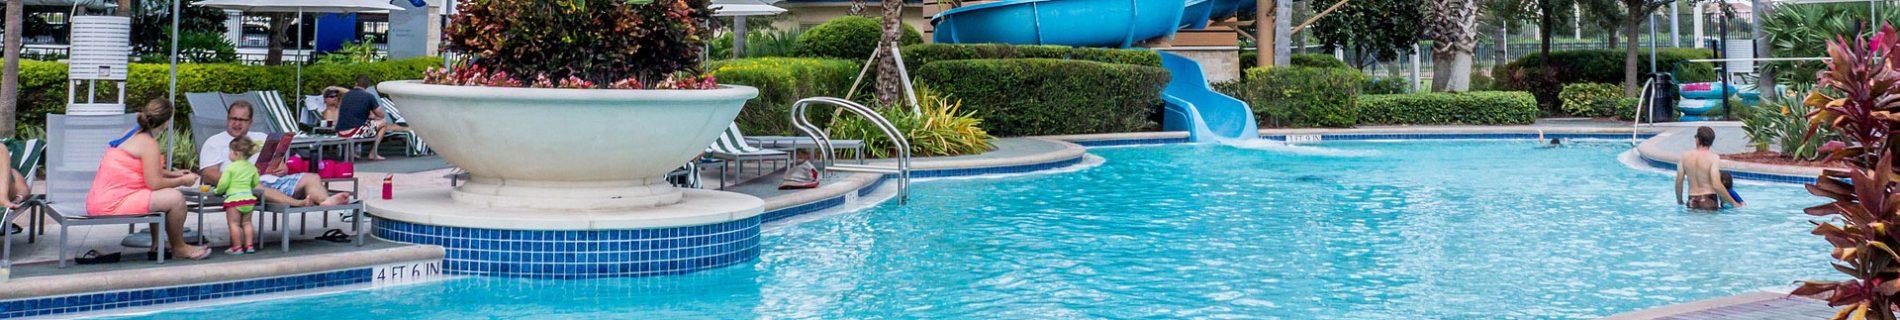 La Jolla Pool Services